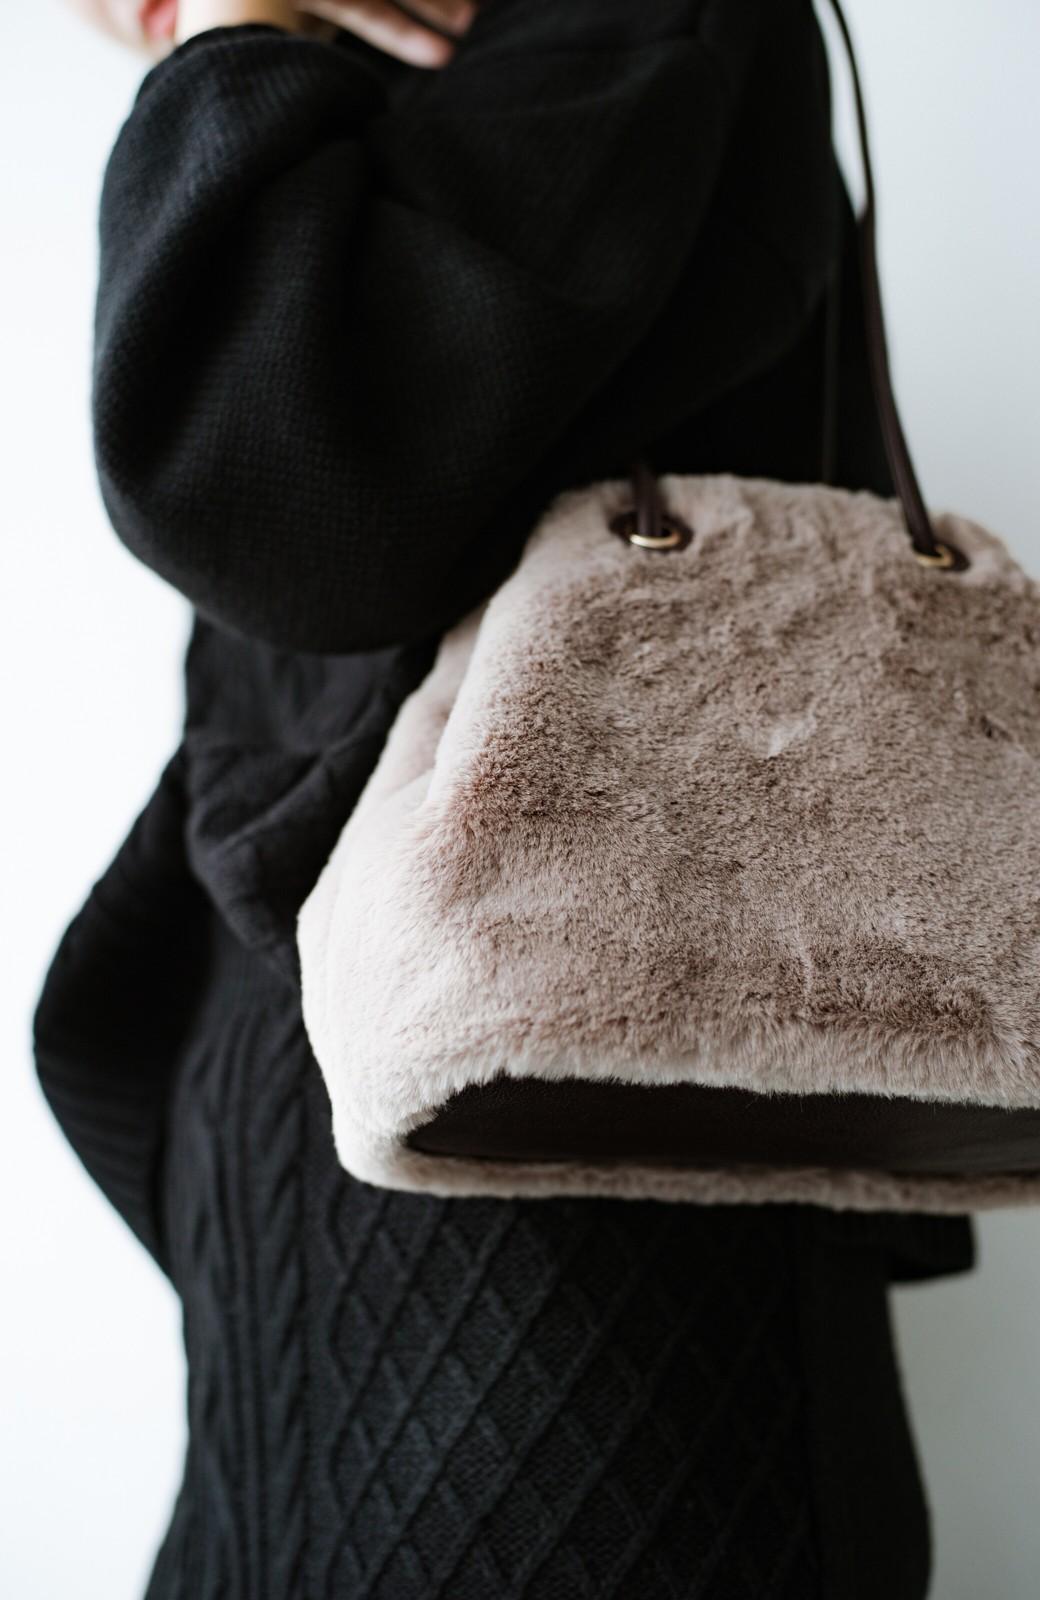 haco! さっと持って気分が上がる ふわっとかわいいエコファー巾着バッグ <グレイッシュベージュ>の商品写真7